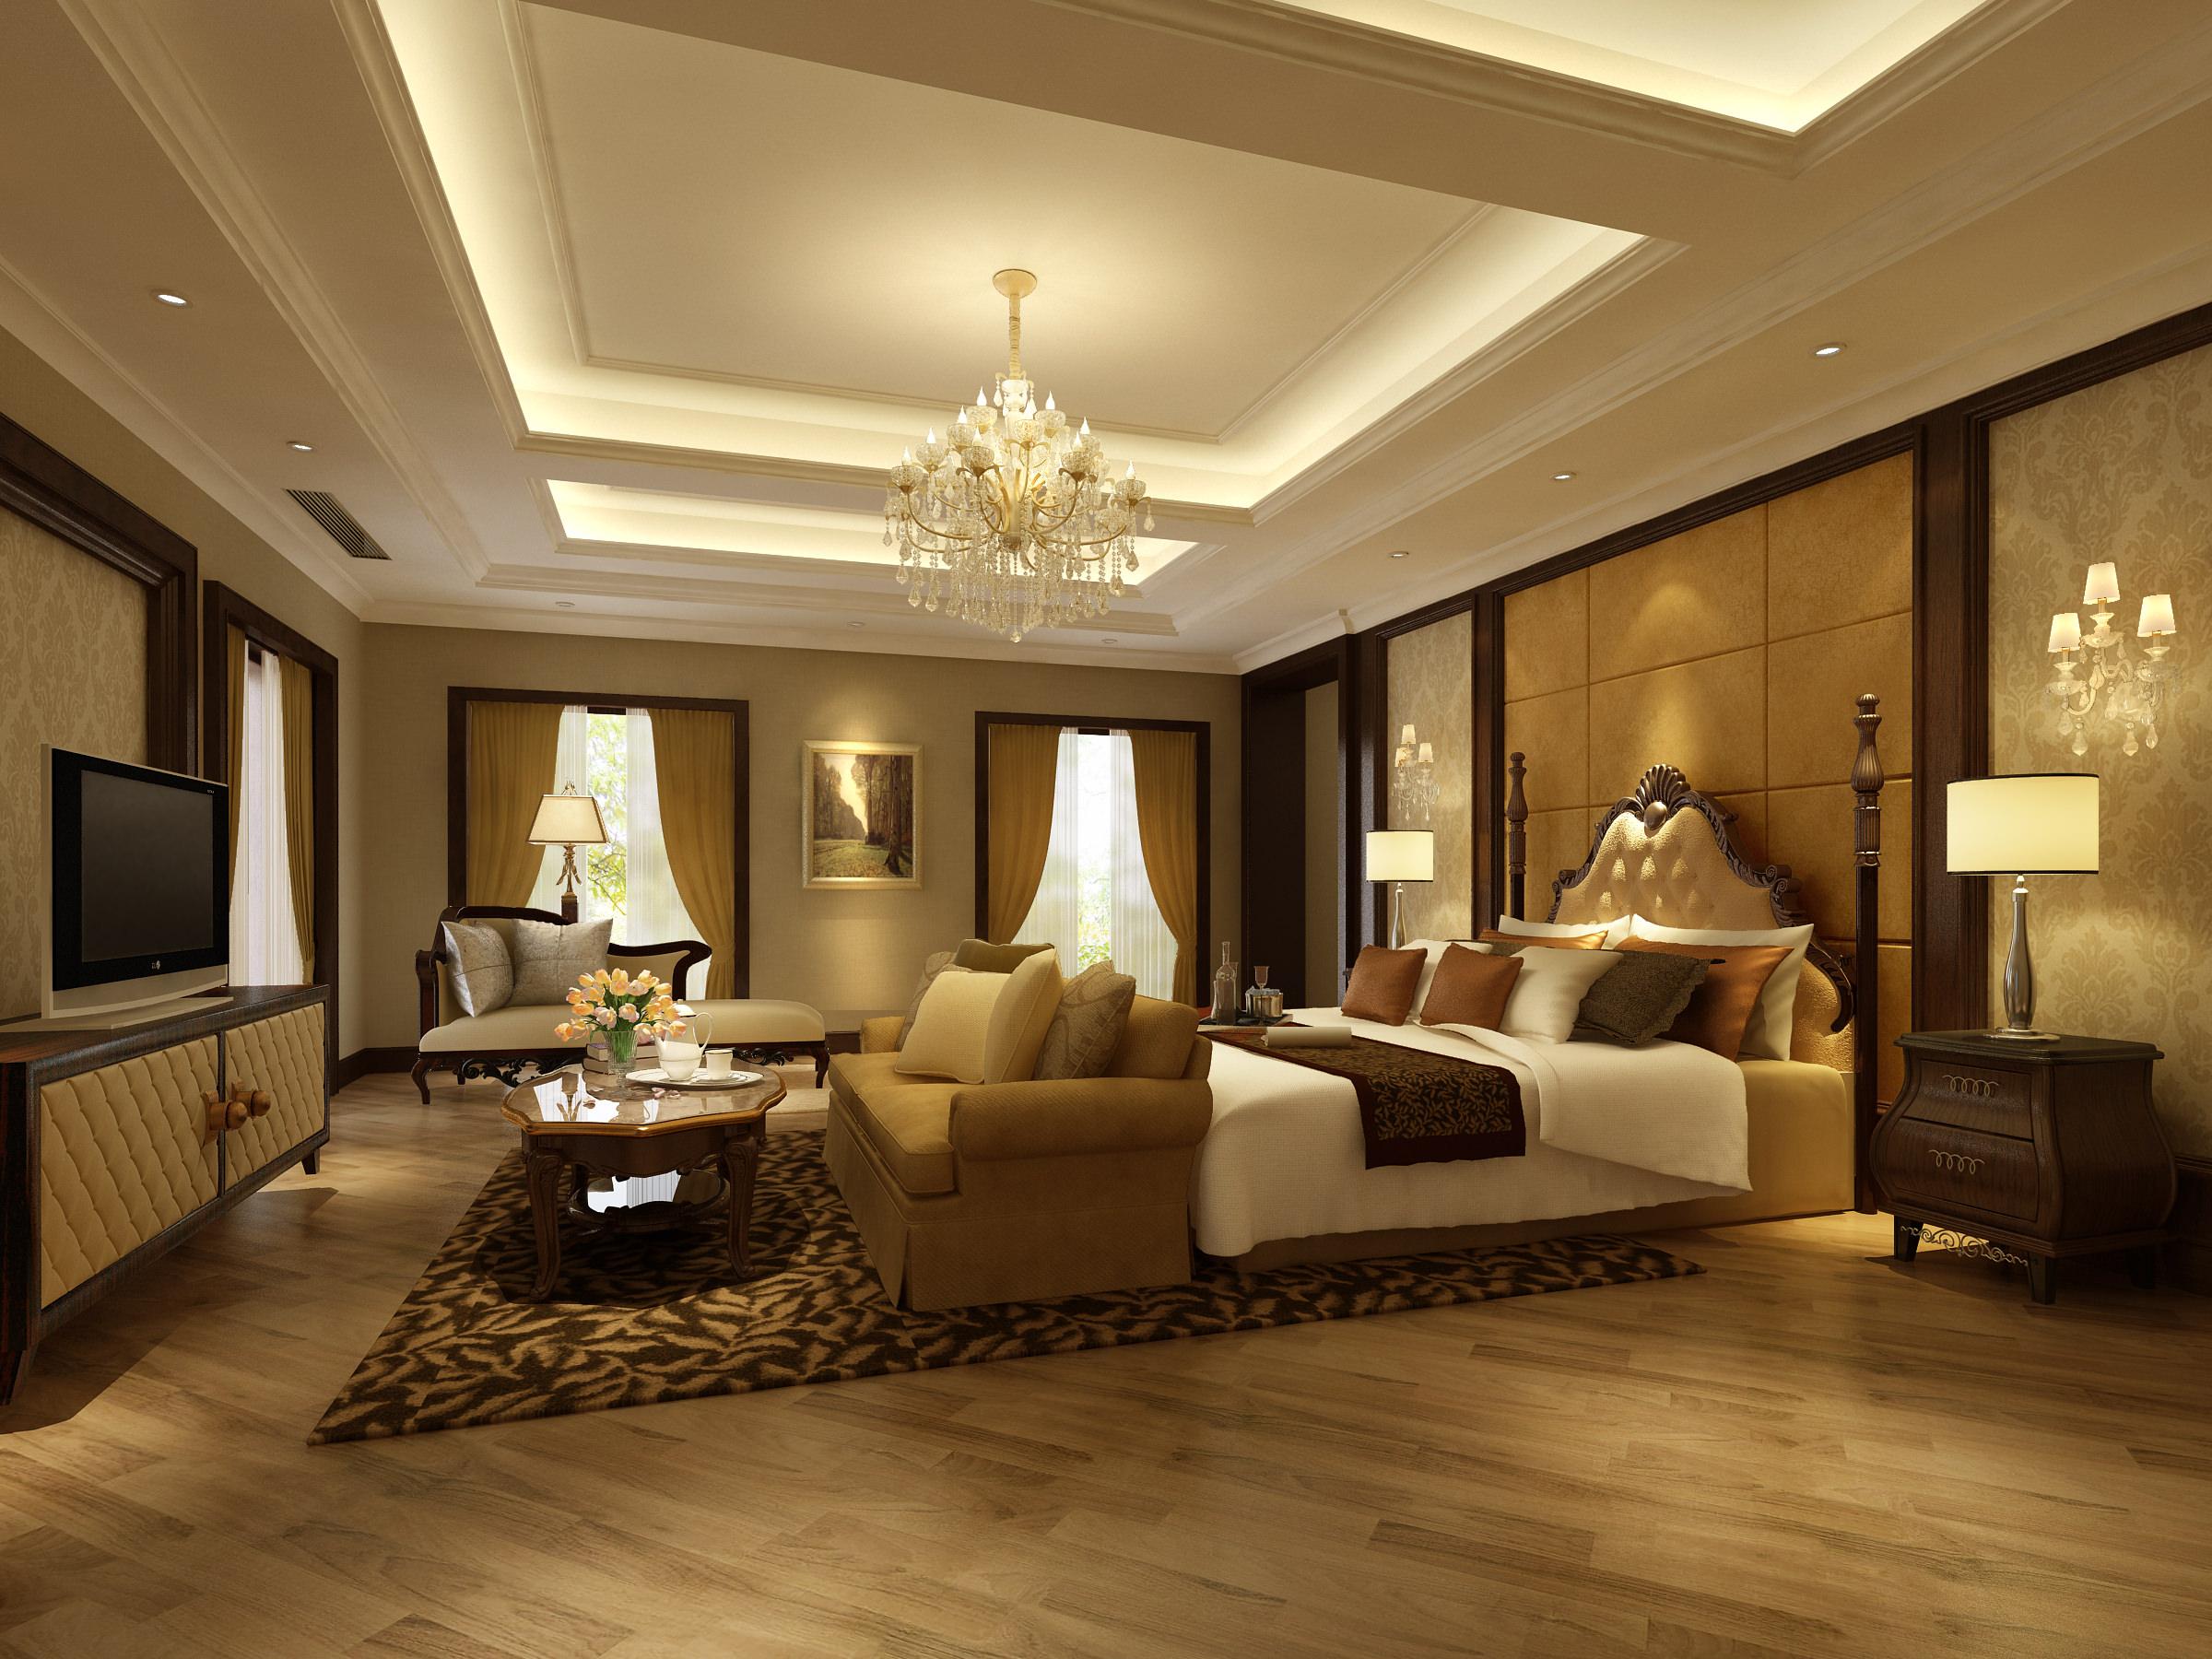 Bedroom or Hotel Room 3D Model MAX   CGTrader.com on New Model Bedroom  id=60635